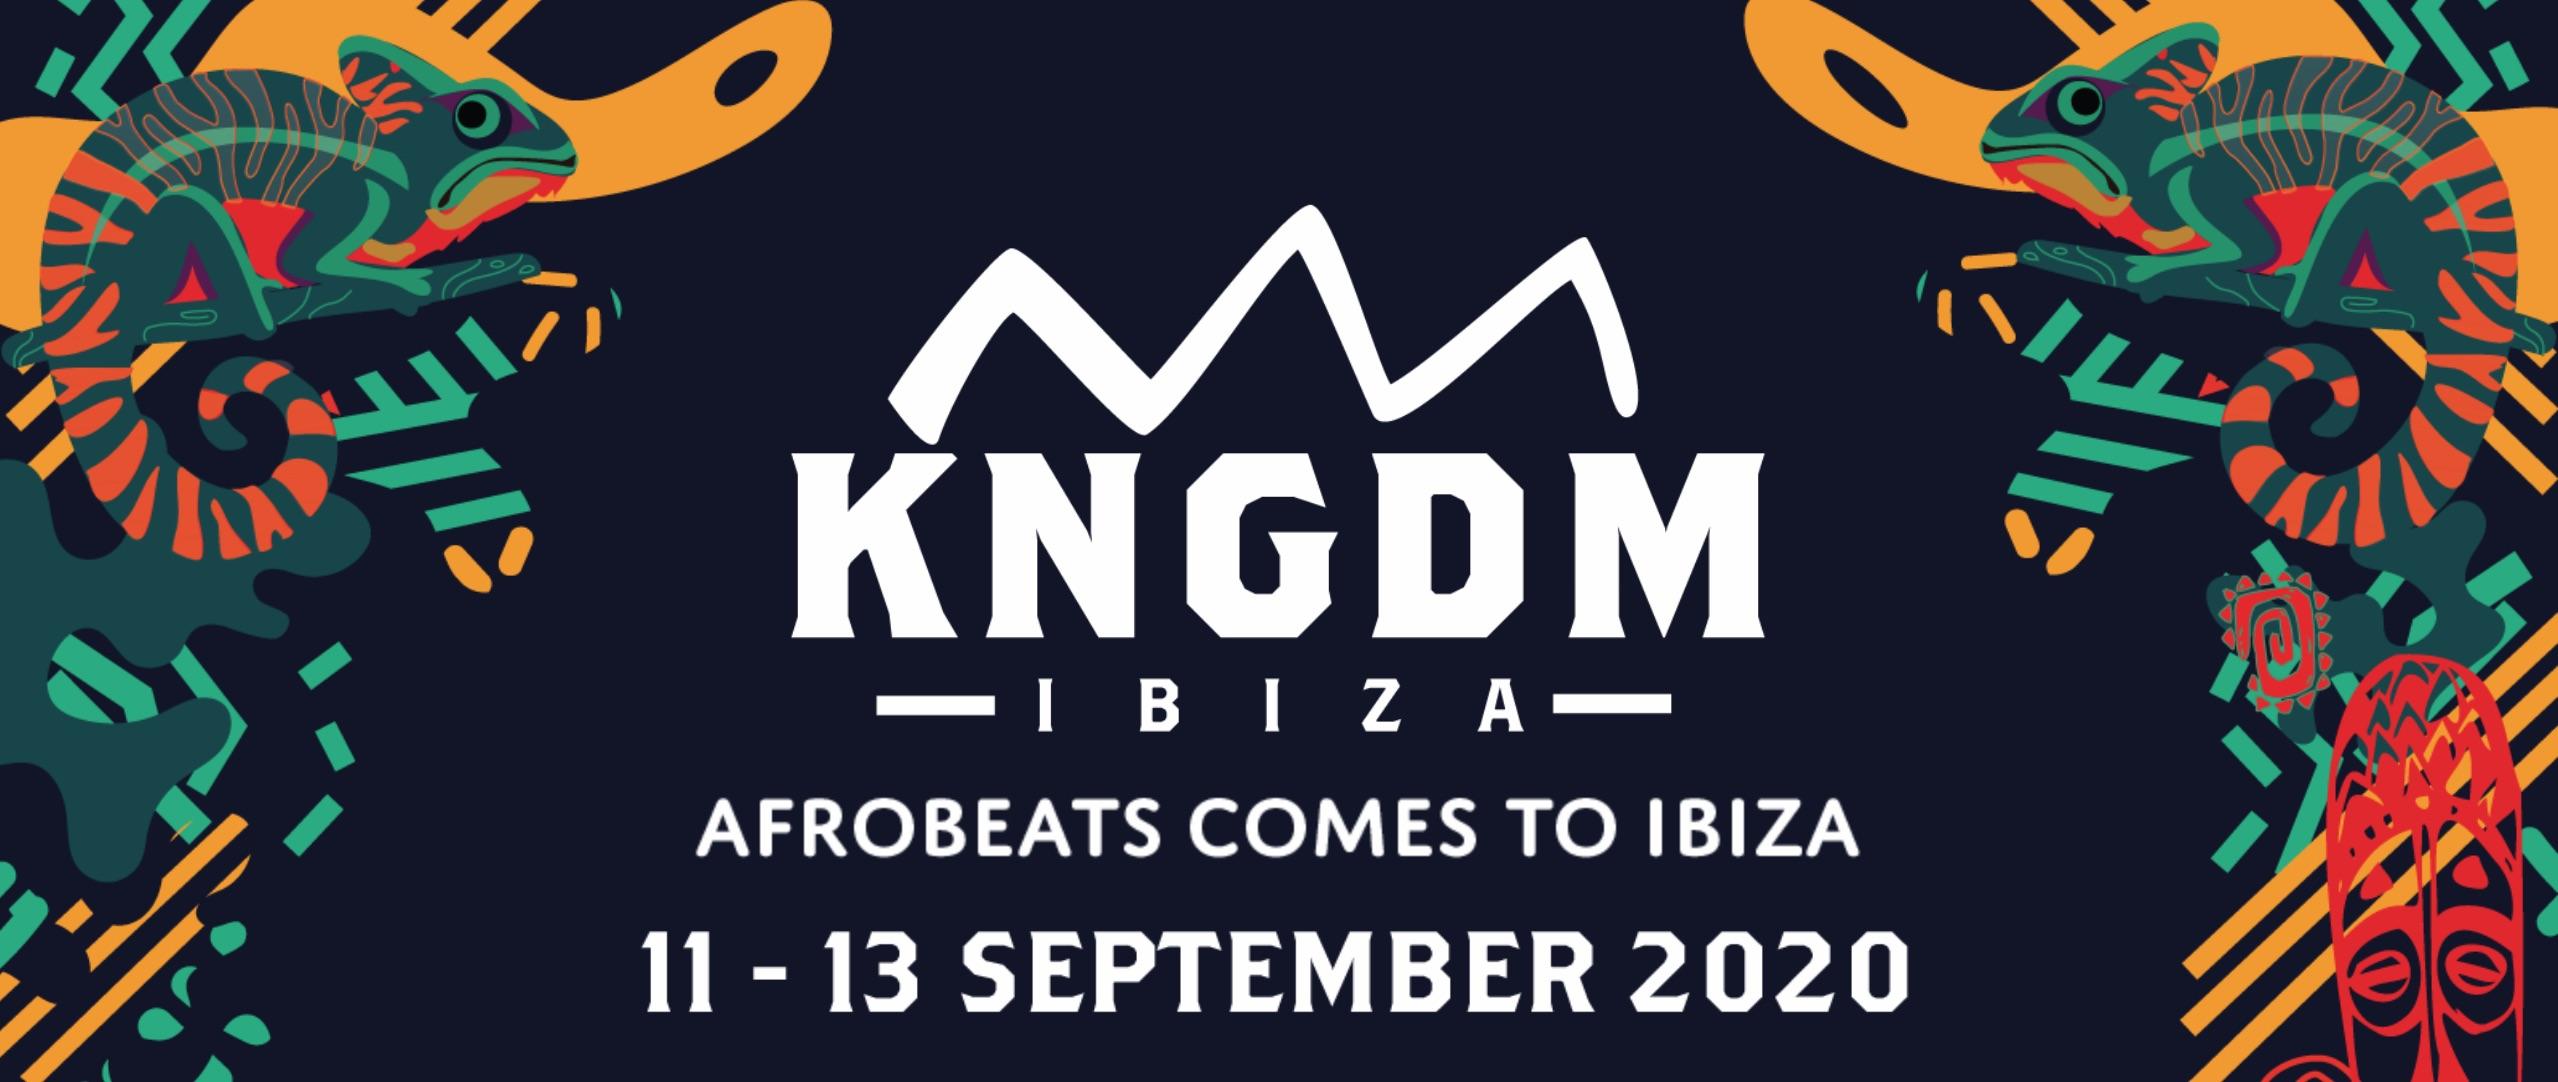 KNGDM Festival Ibiza Rocks 2020